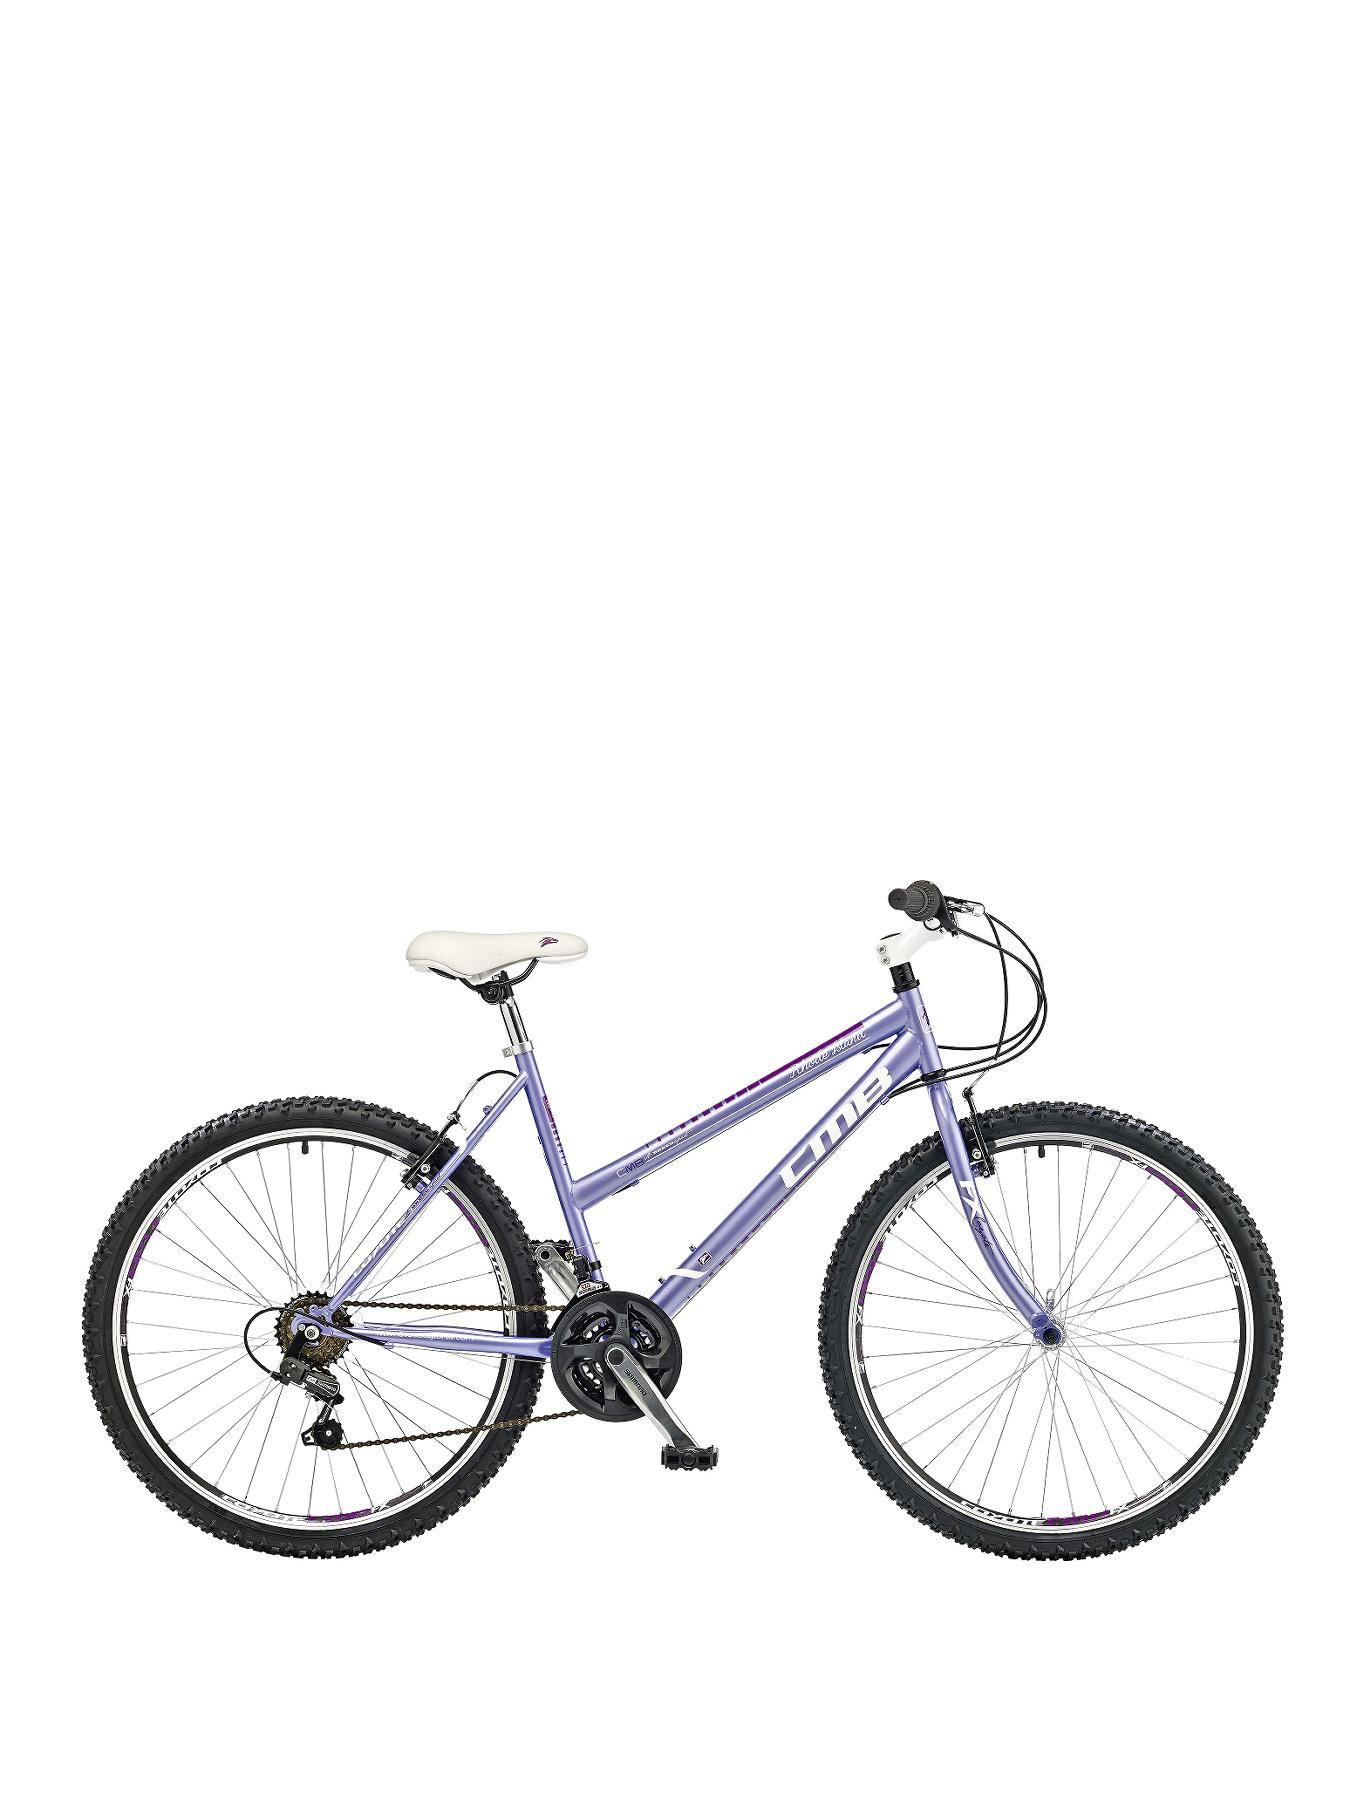 Coyote Rhode Island 18 inch Ladies Mountain Bike